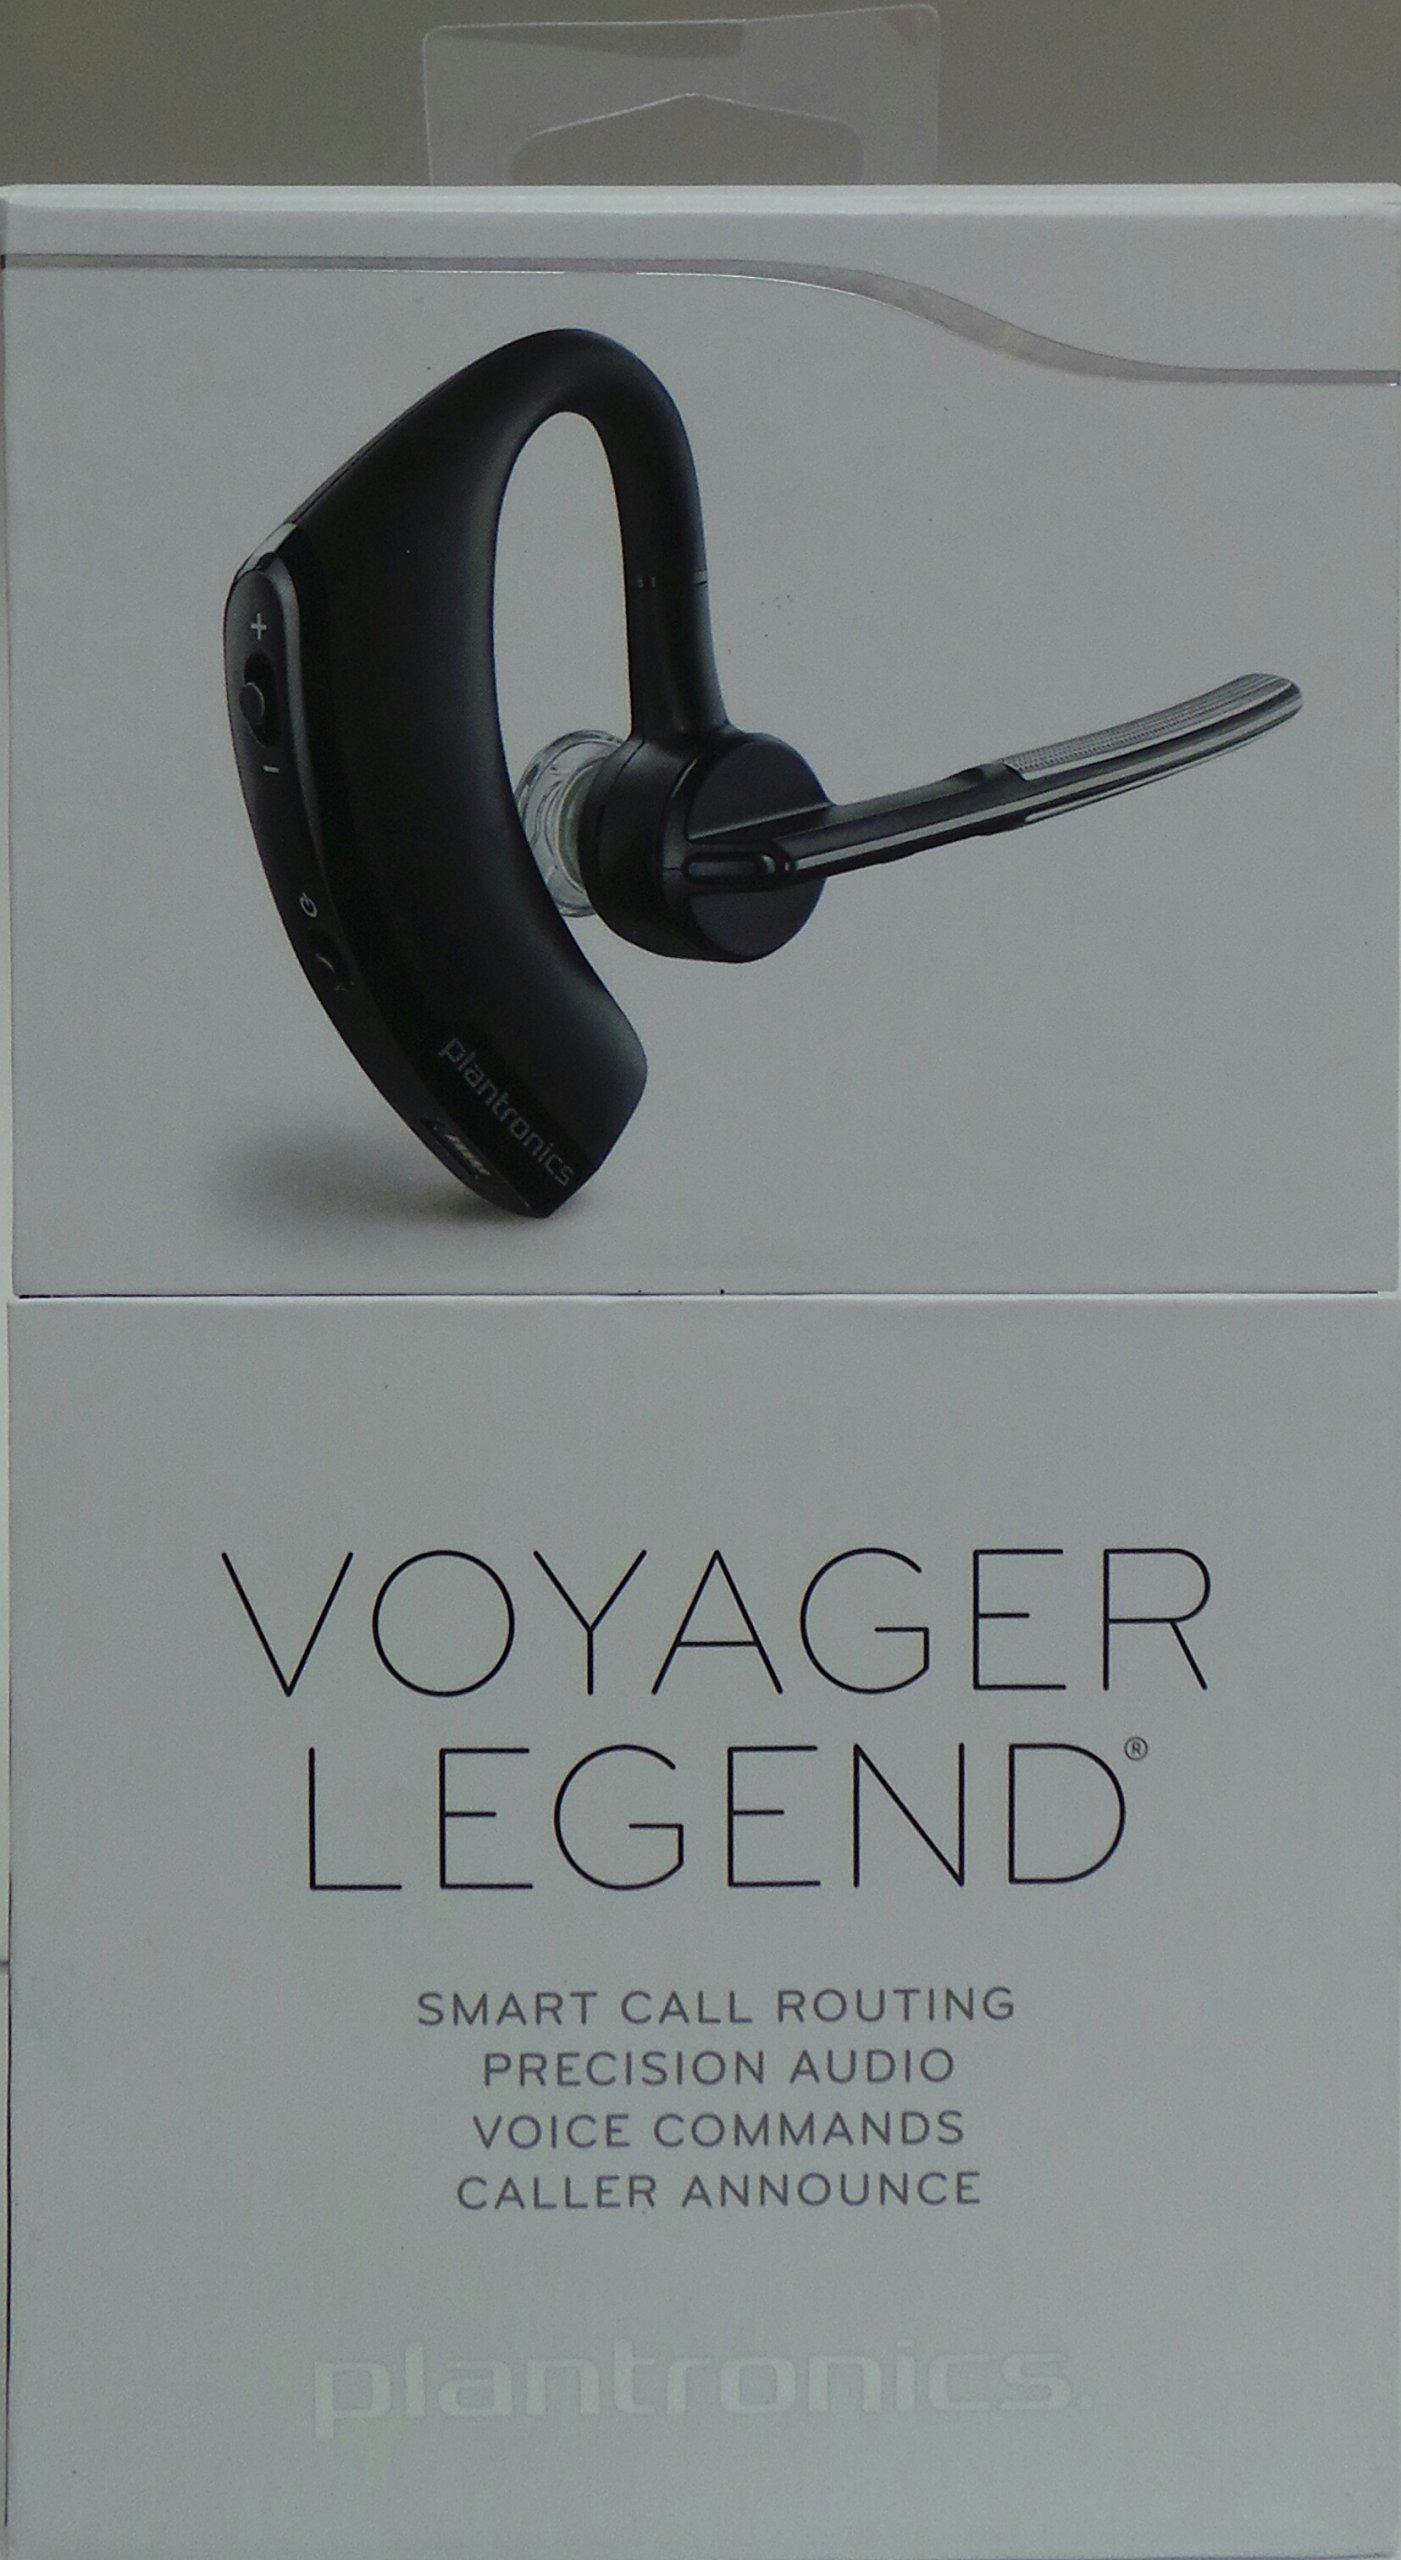 Plantronics 87300-60 Voyager Legend Bluetooth Headset by Plantronics